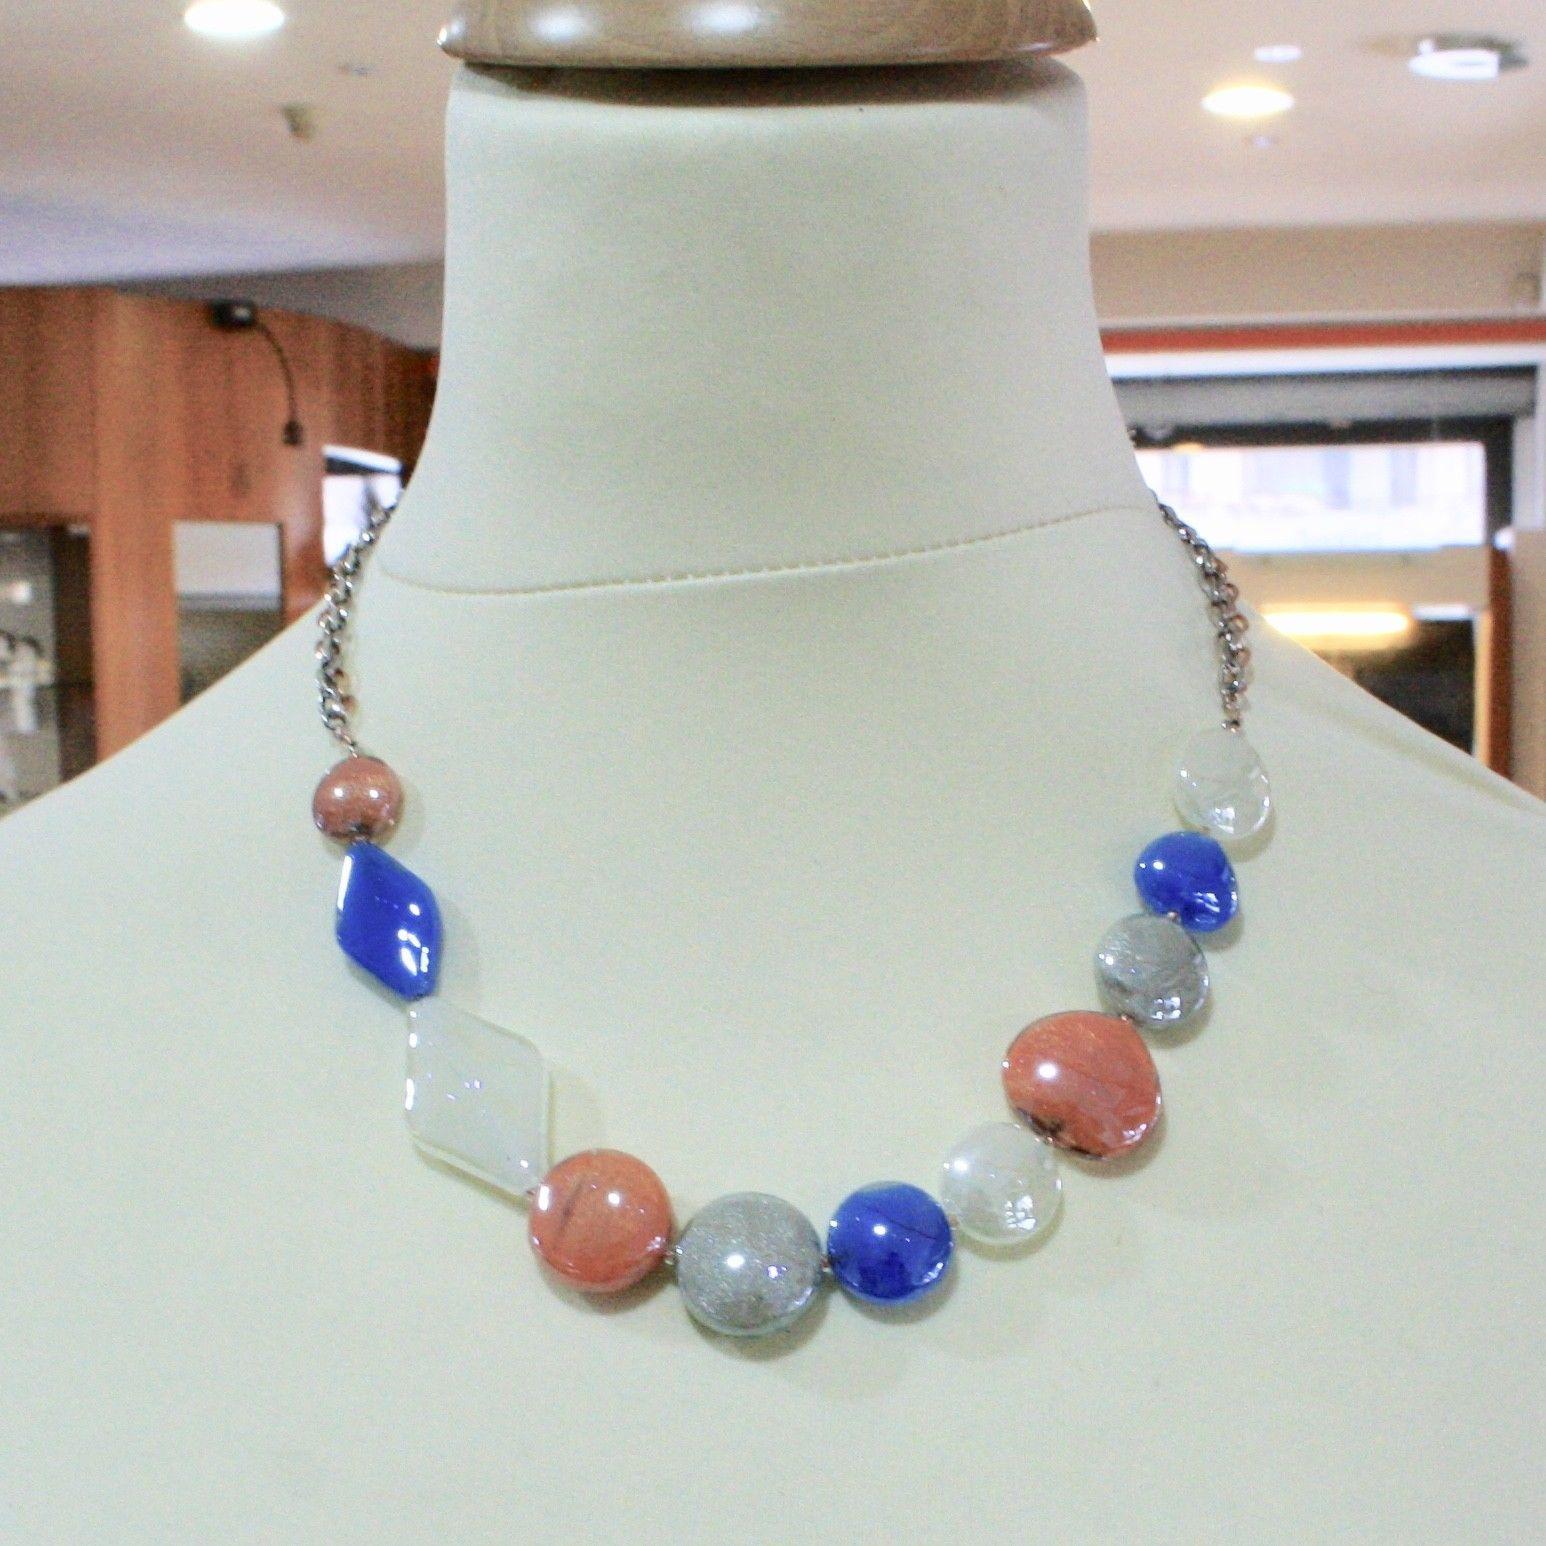 ANTICA MURRINA VENEZIA NECKLACE WITH MURANO GLASS GRAY ORANGE BLUE COA86A46